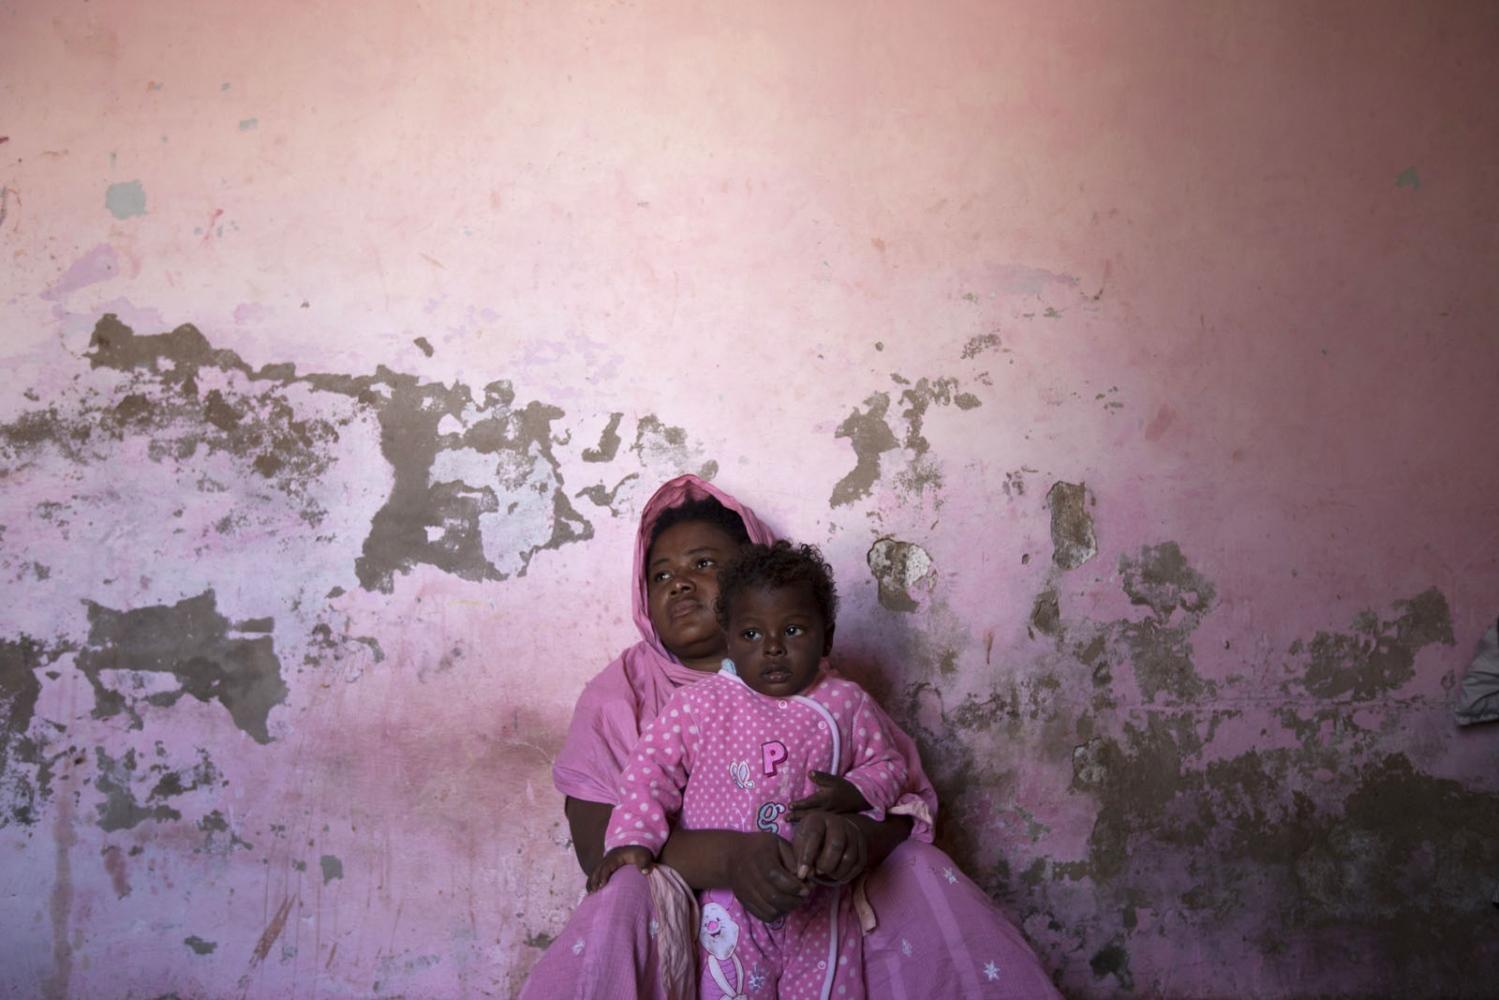 Art and Documentary Photography - Loading Sidi_SouthAsia40.JPG